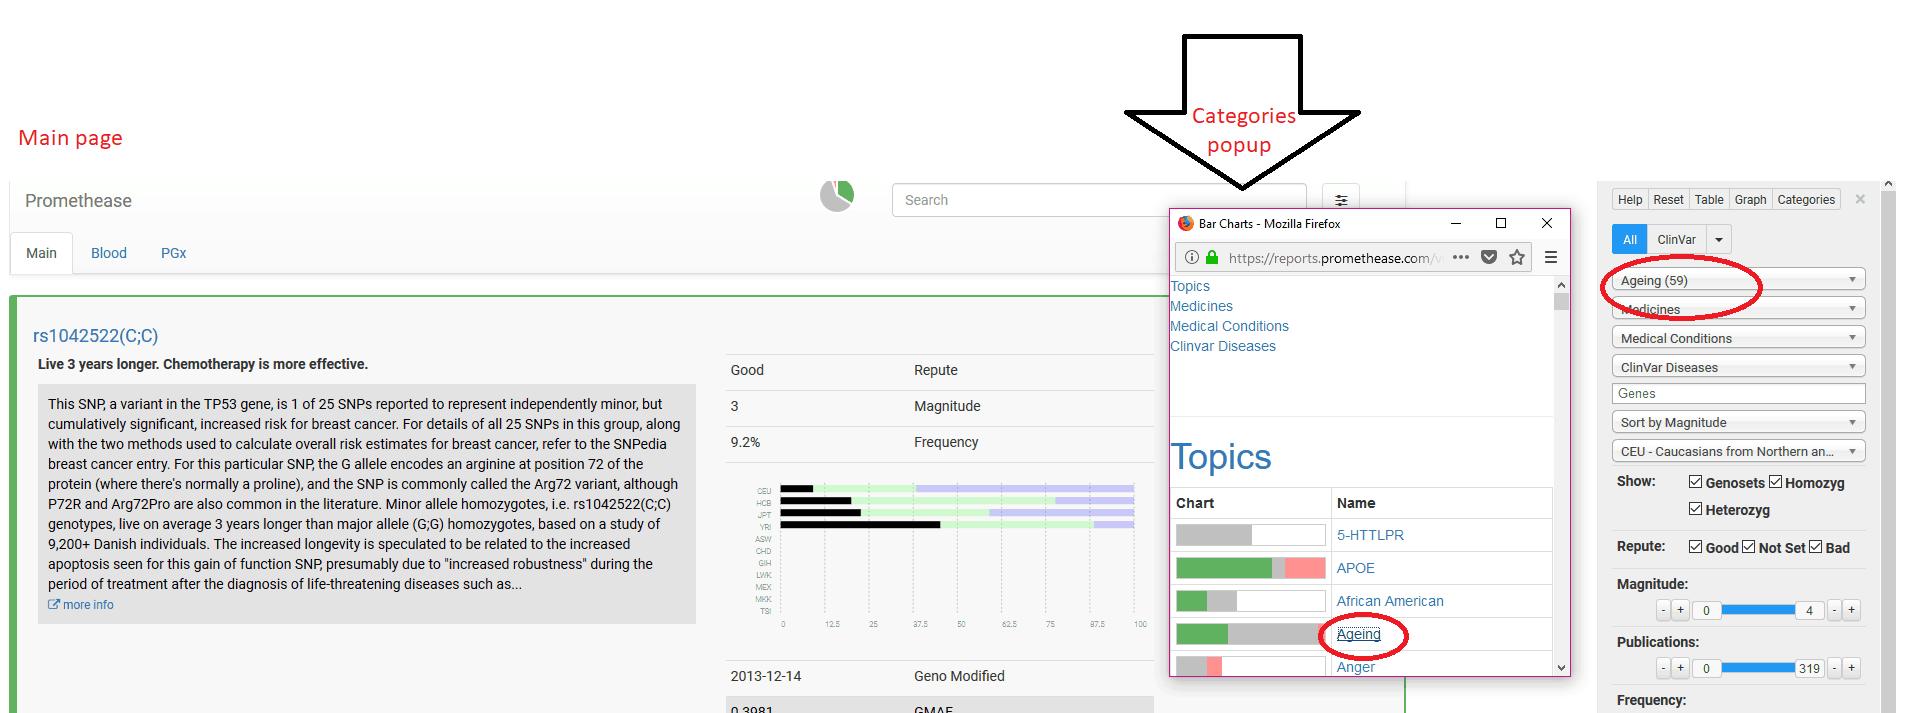 23andme health reports alternative categories